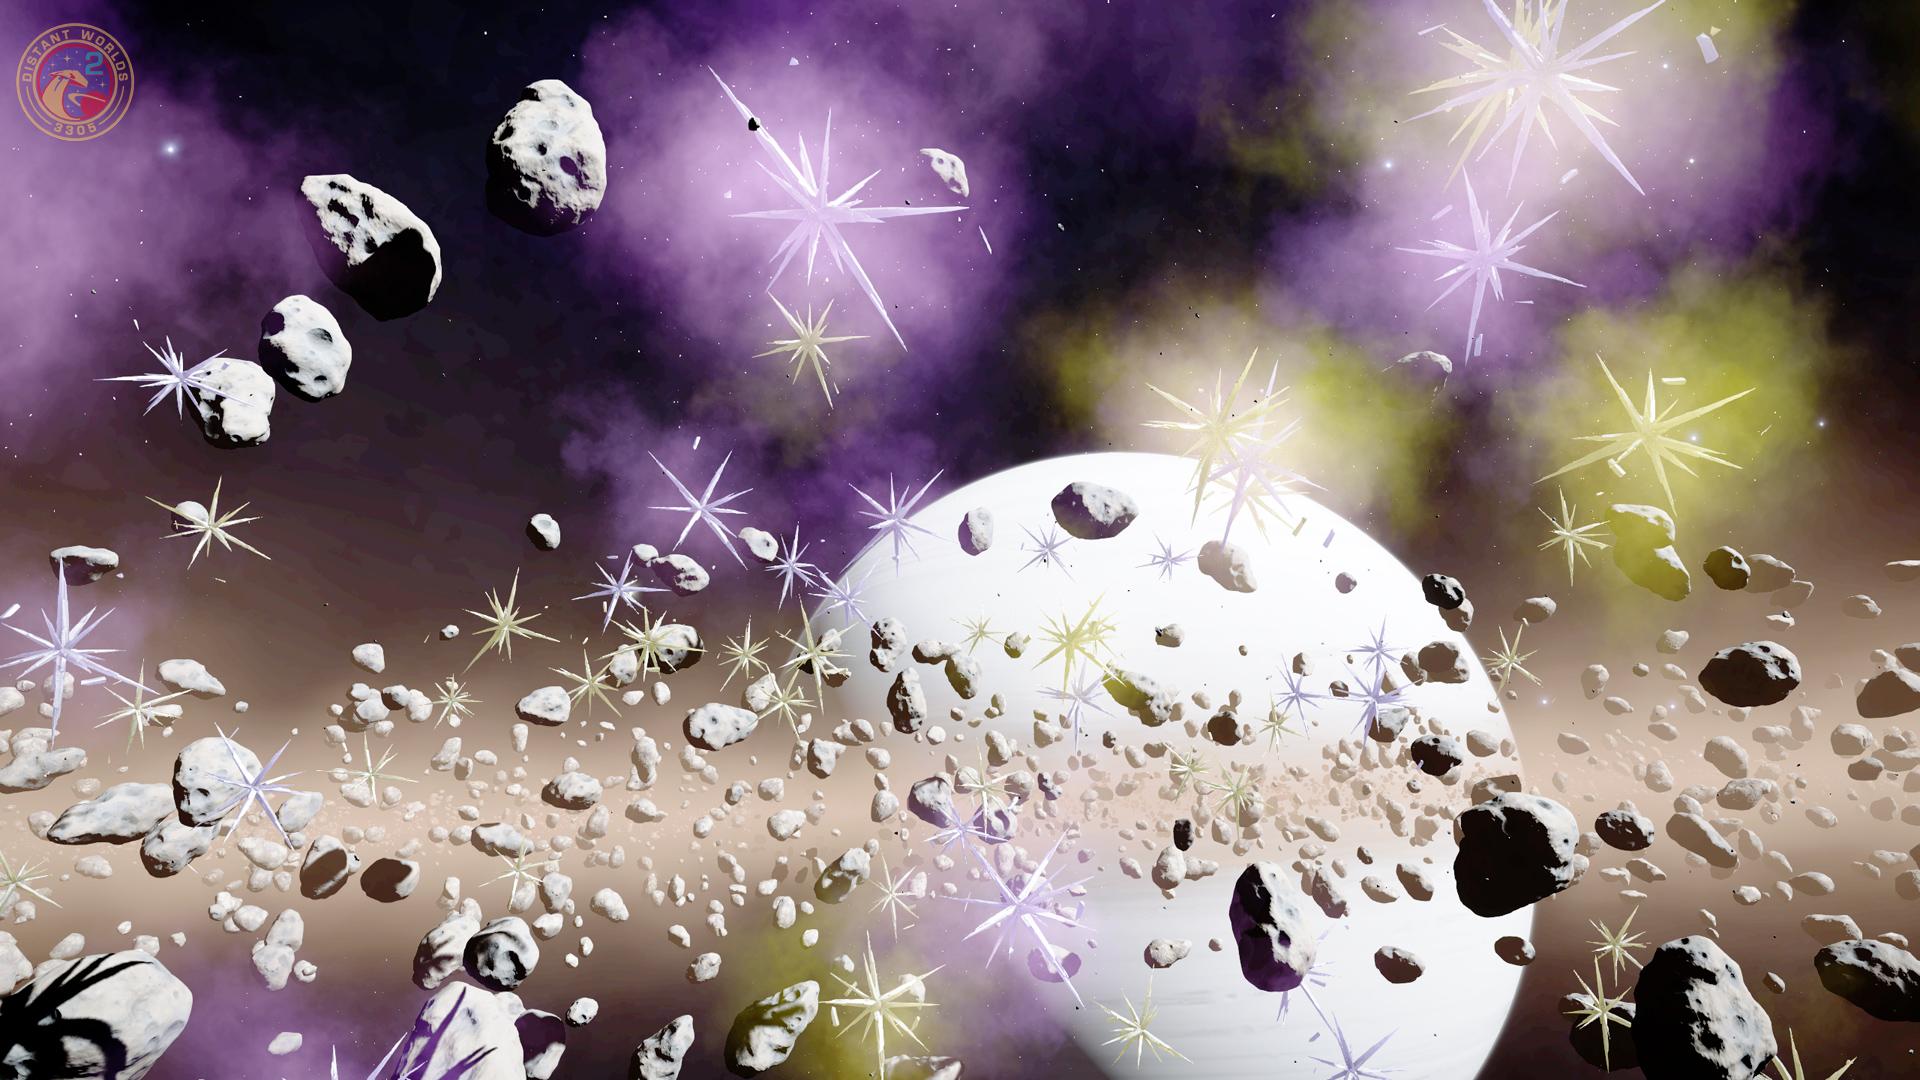 dw2-11-005-biostellarnbk6t.jpg